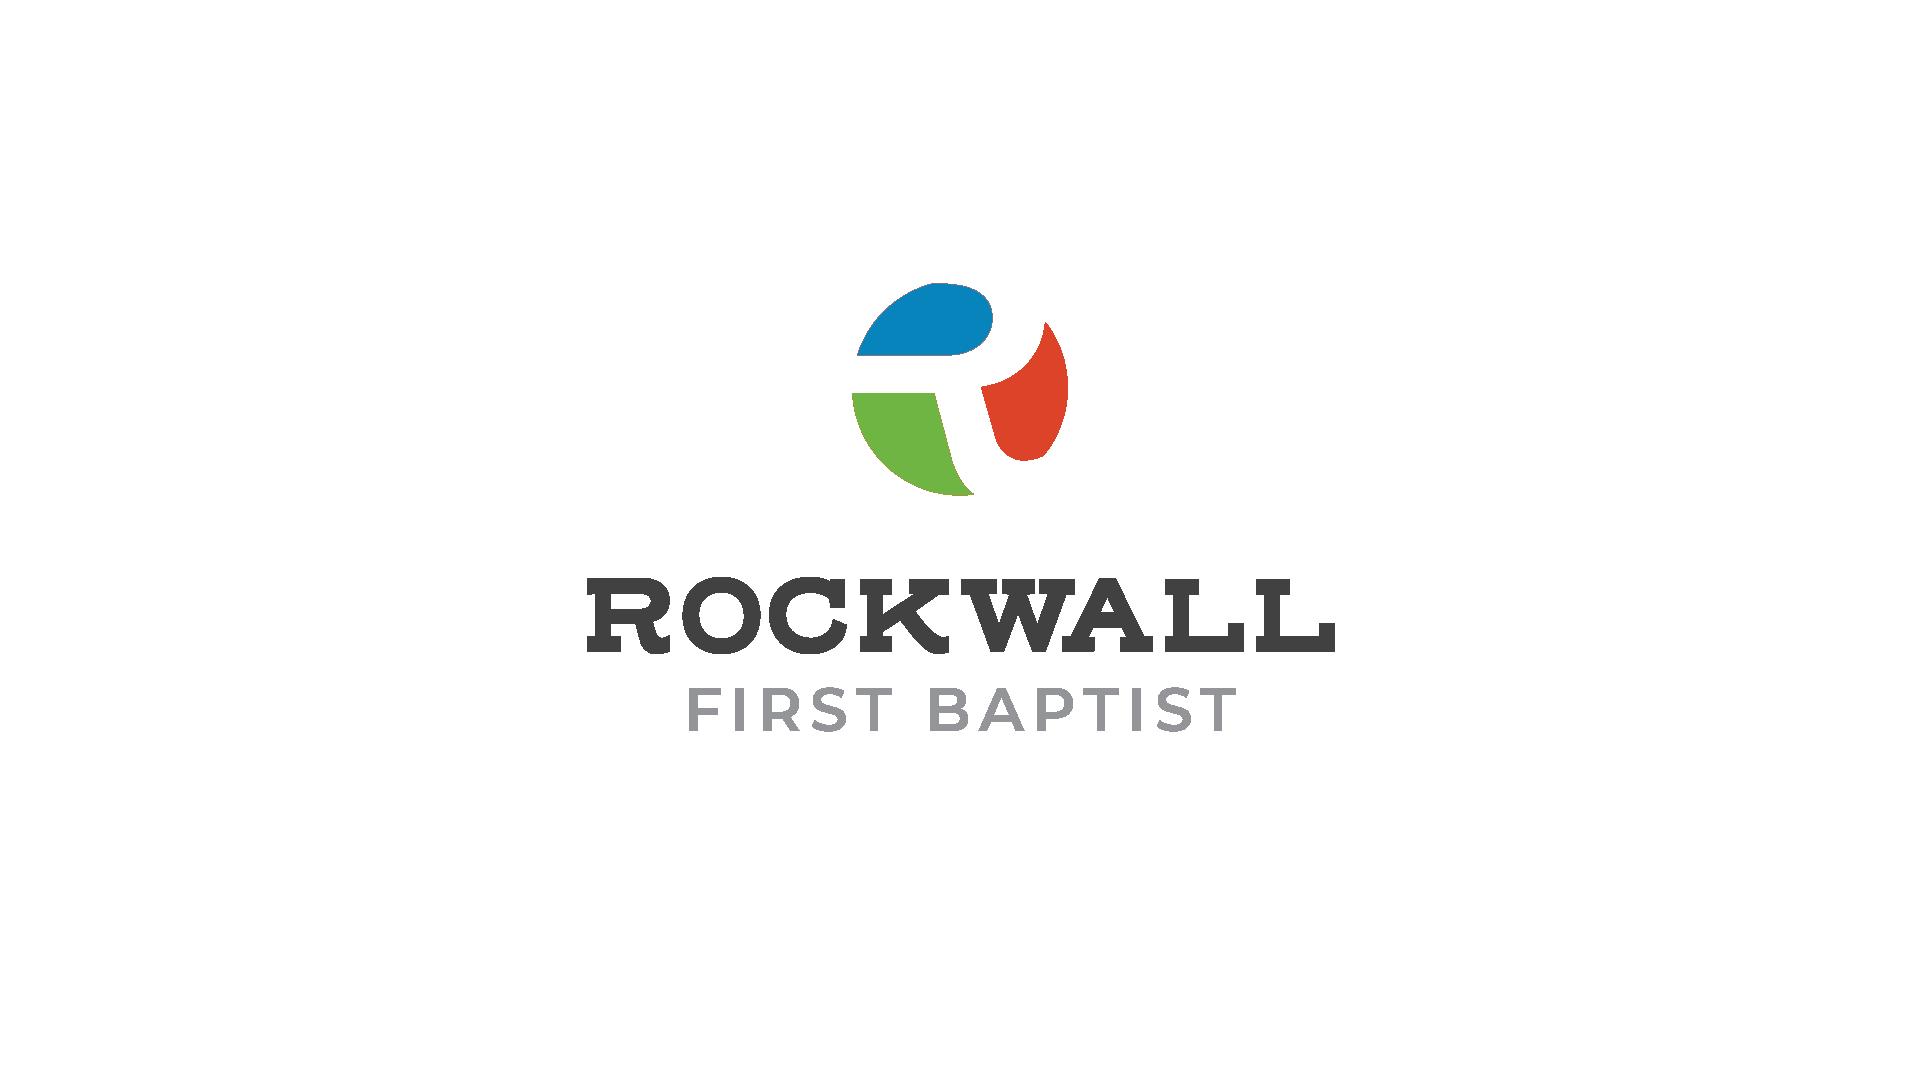 First Baptist Rockwall